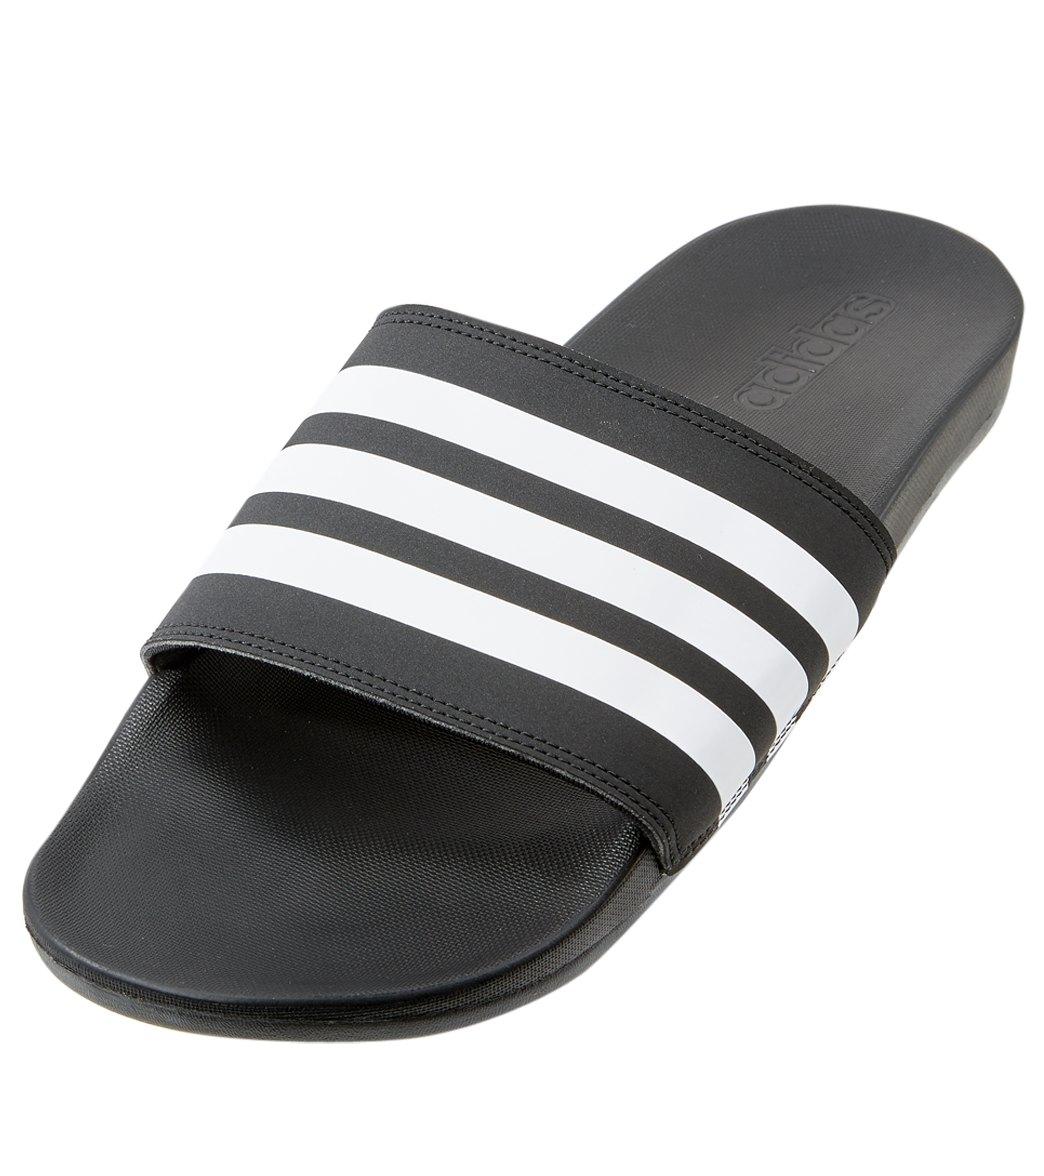 6b4ffad5356c69 Adidas Men s Adilette CF+ Slide Sandals at SwimOutlet.com